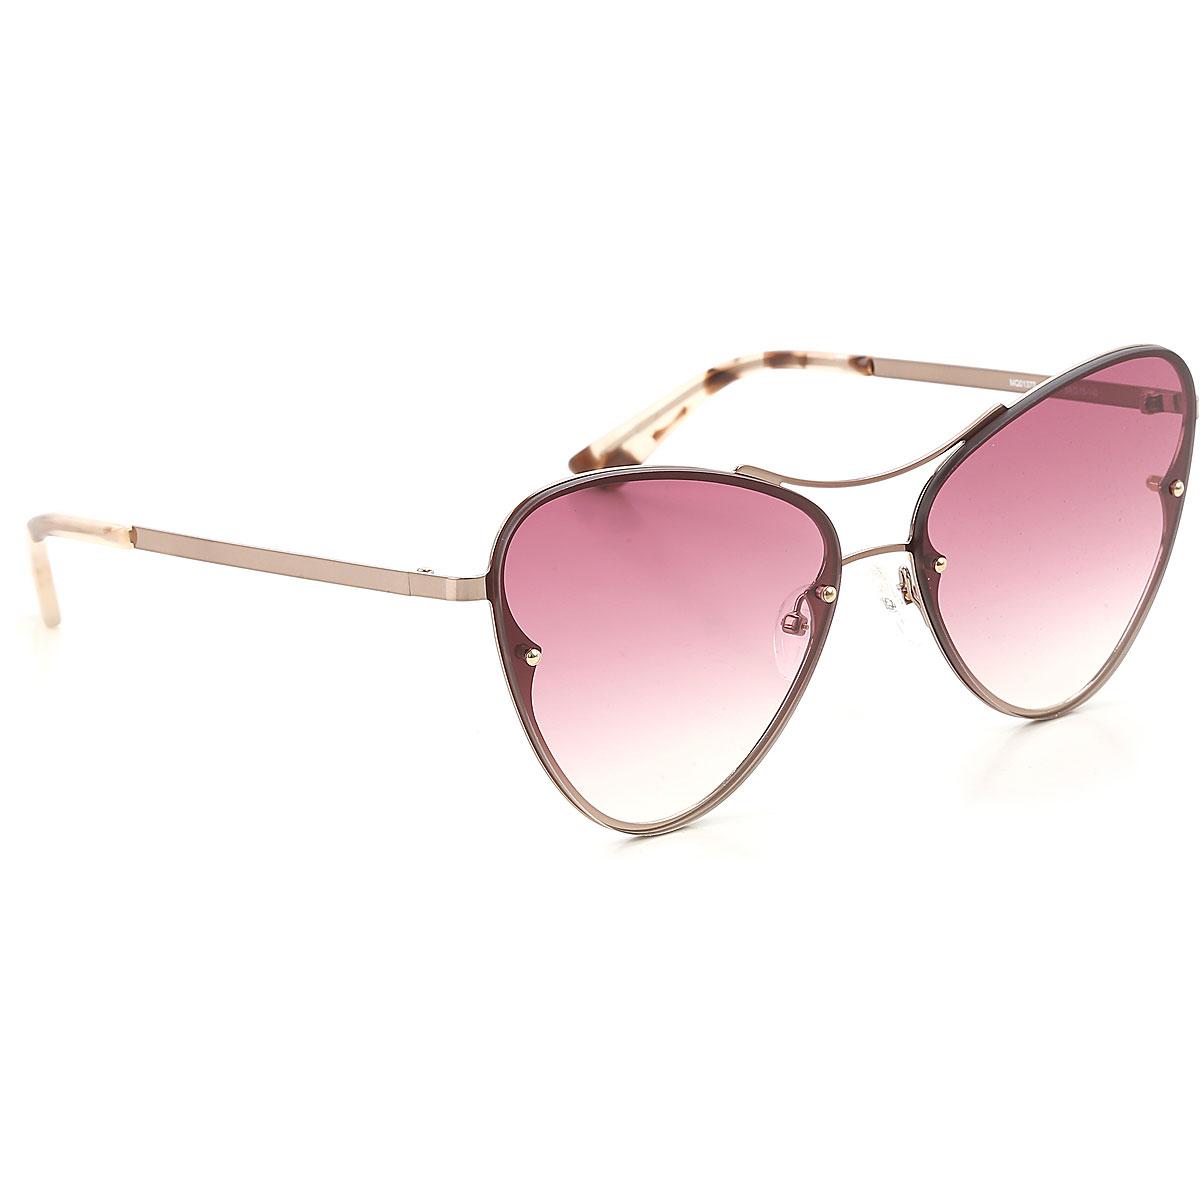 Alexander McQueen McQ Sunglasses On Sale, Rose Gold, 2019